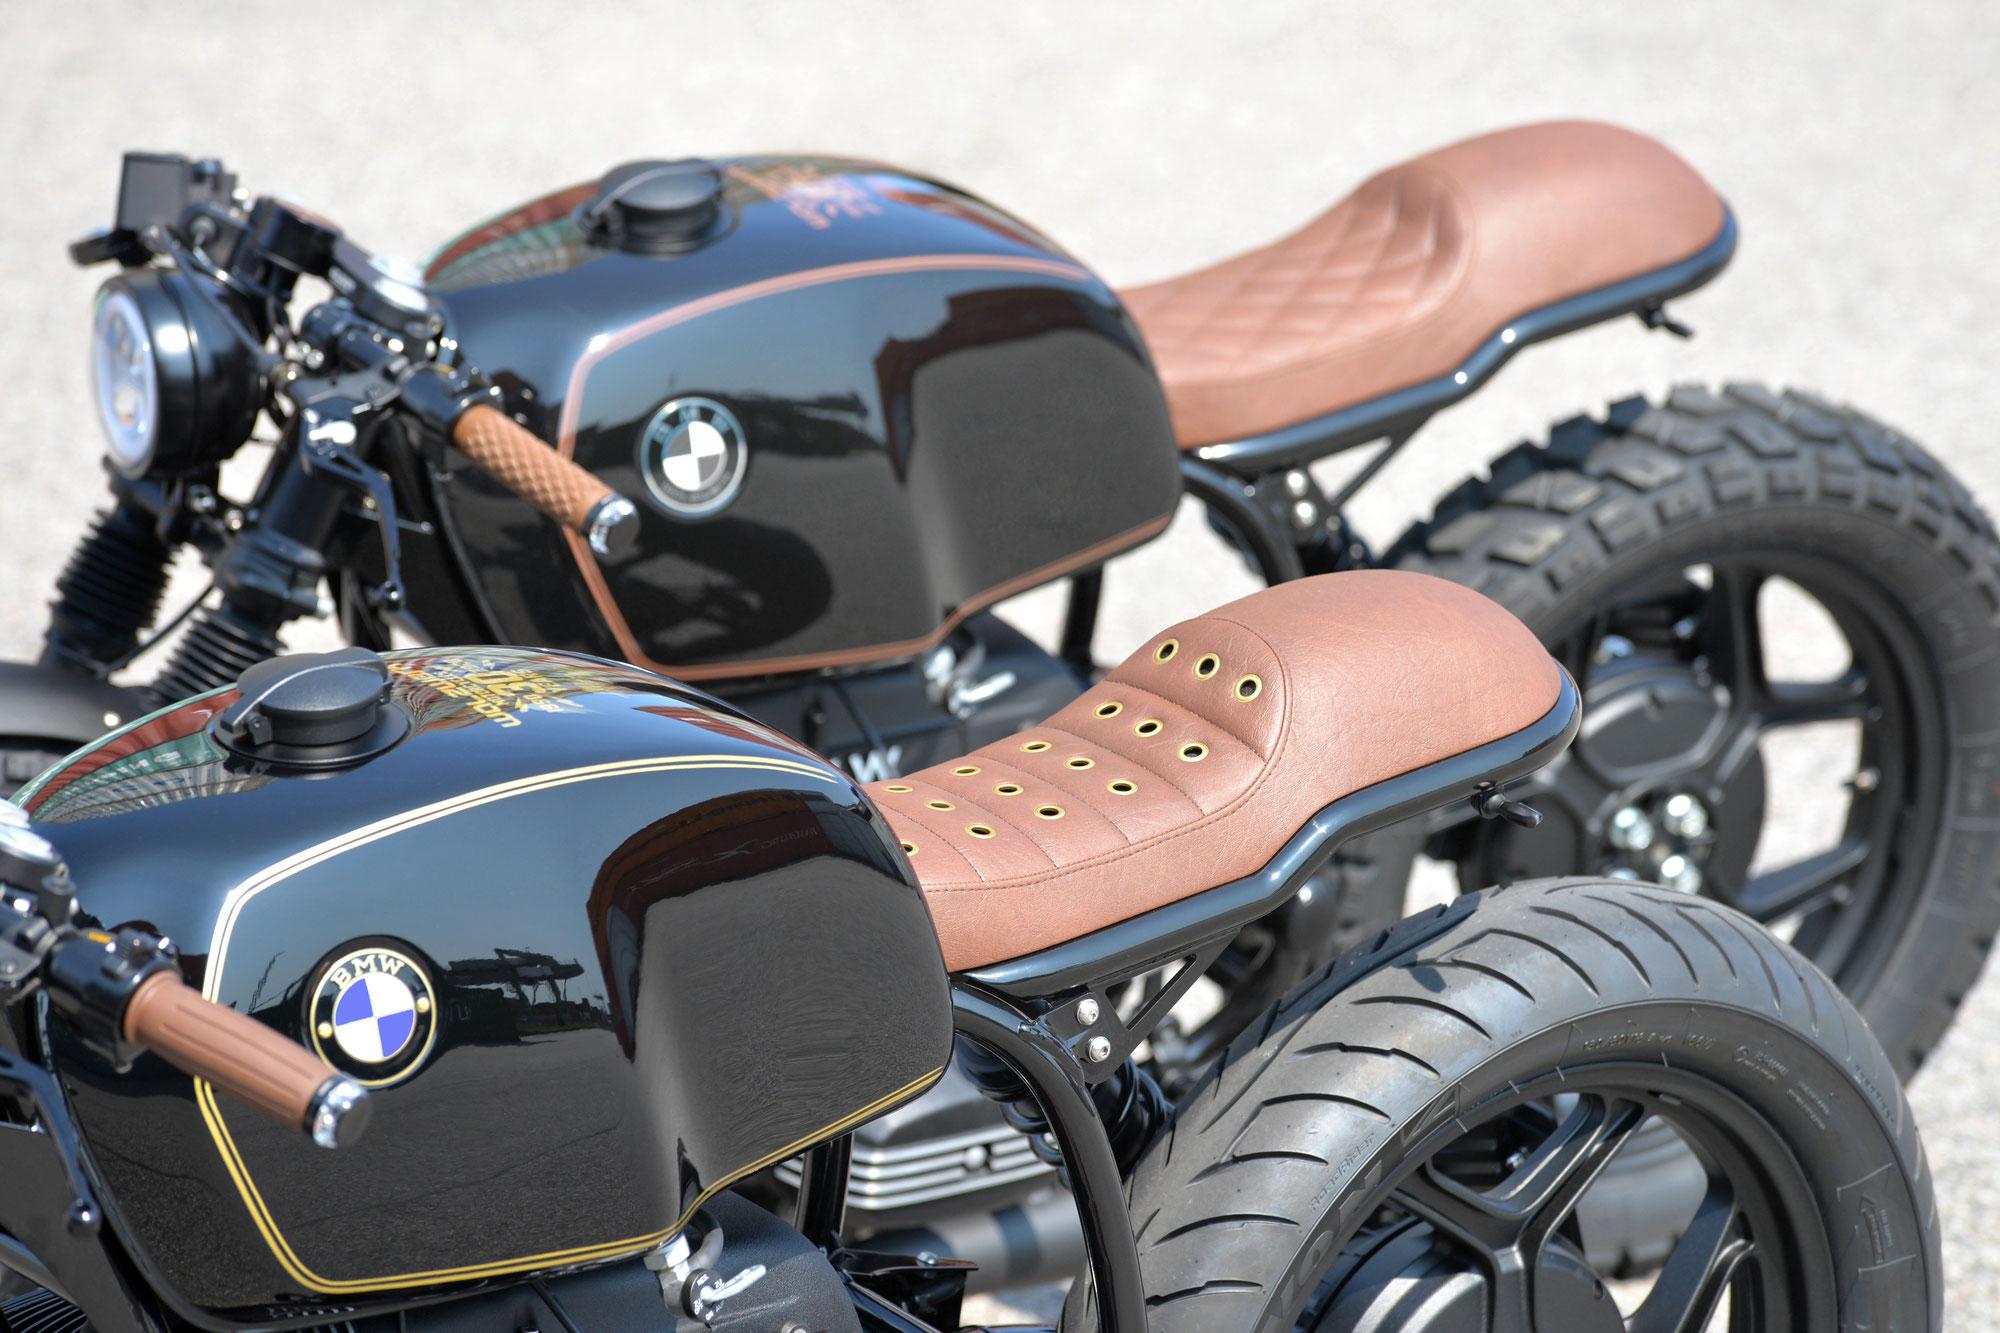 New Bikes: SCHIZZO® Double Pack for Belgium!